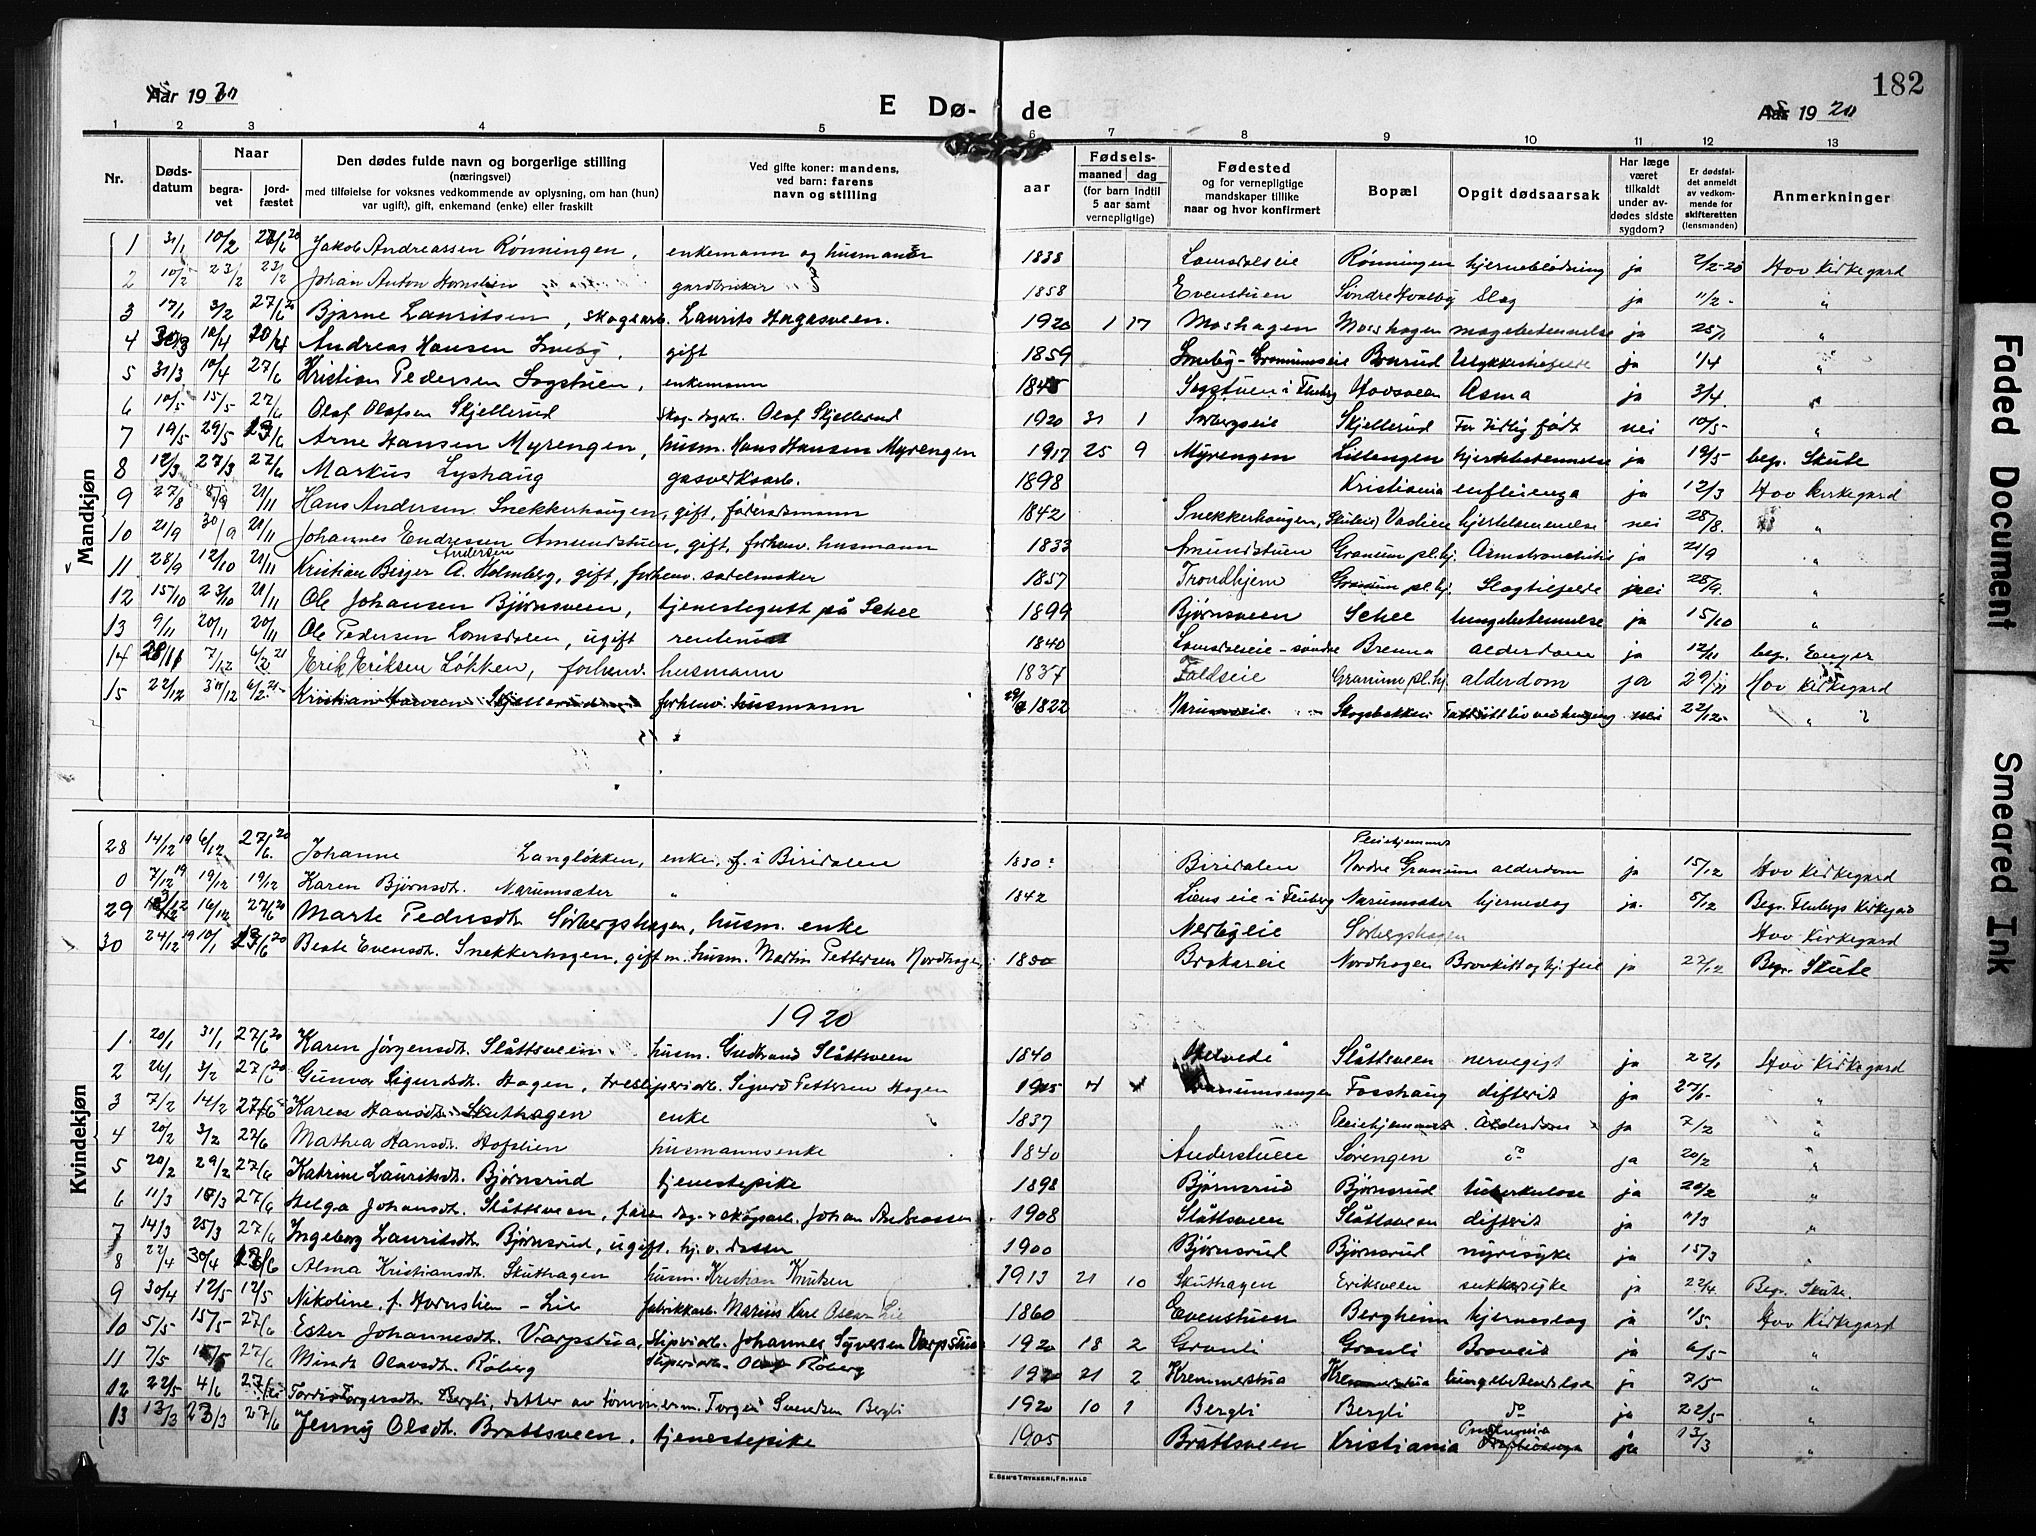 SAH, Søndre Land prestekontor, L/L0007: Klokkerbok nr. 7, 1915-1932, s. 182